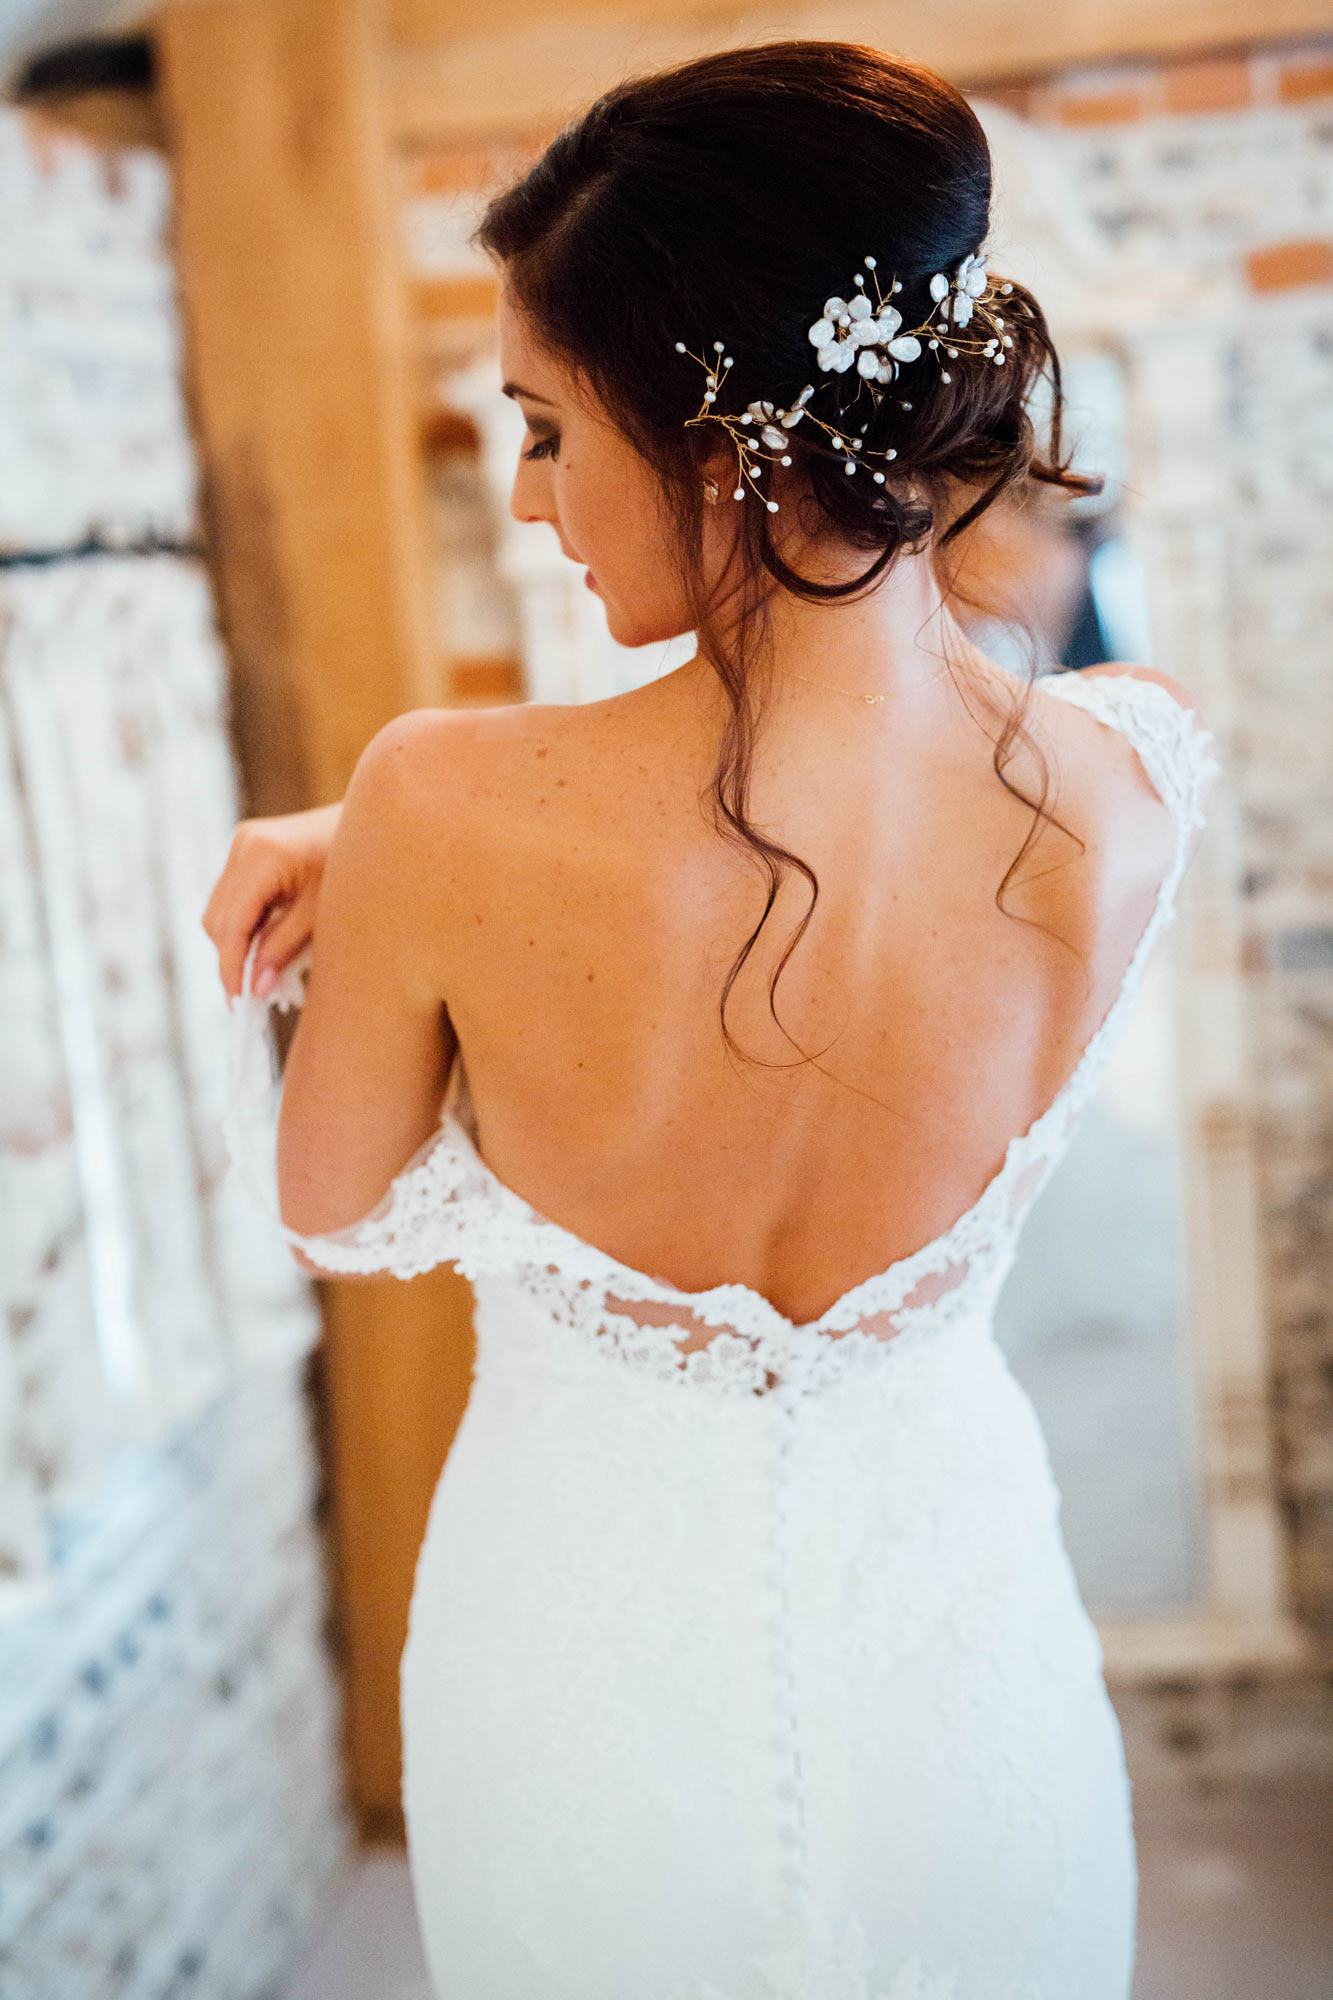 BeckyLee-wedding6.jpg